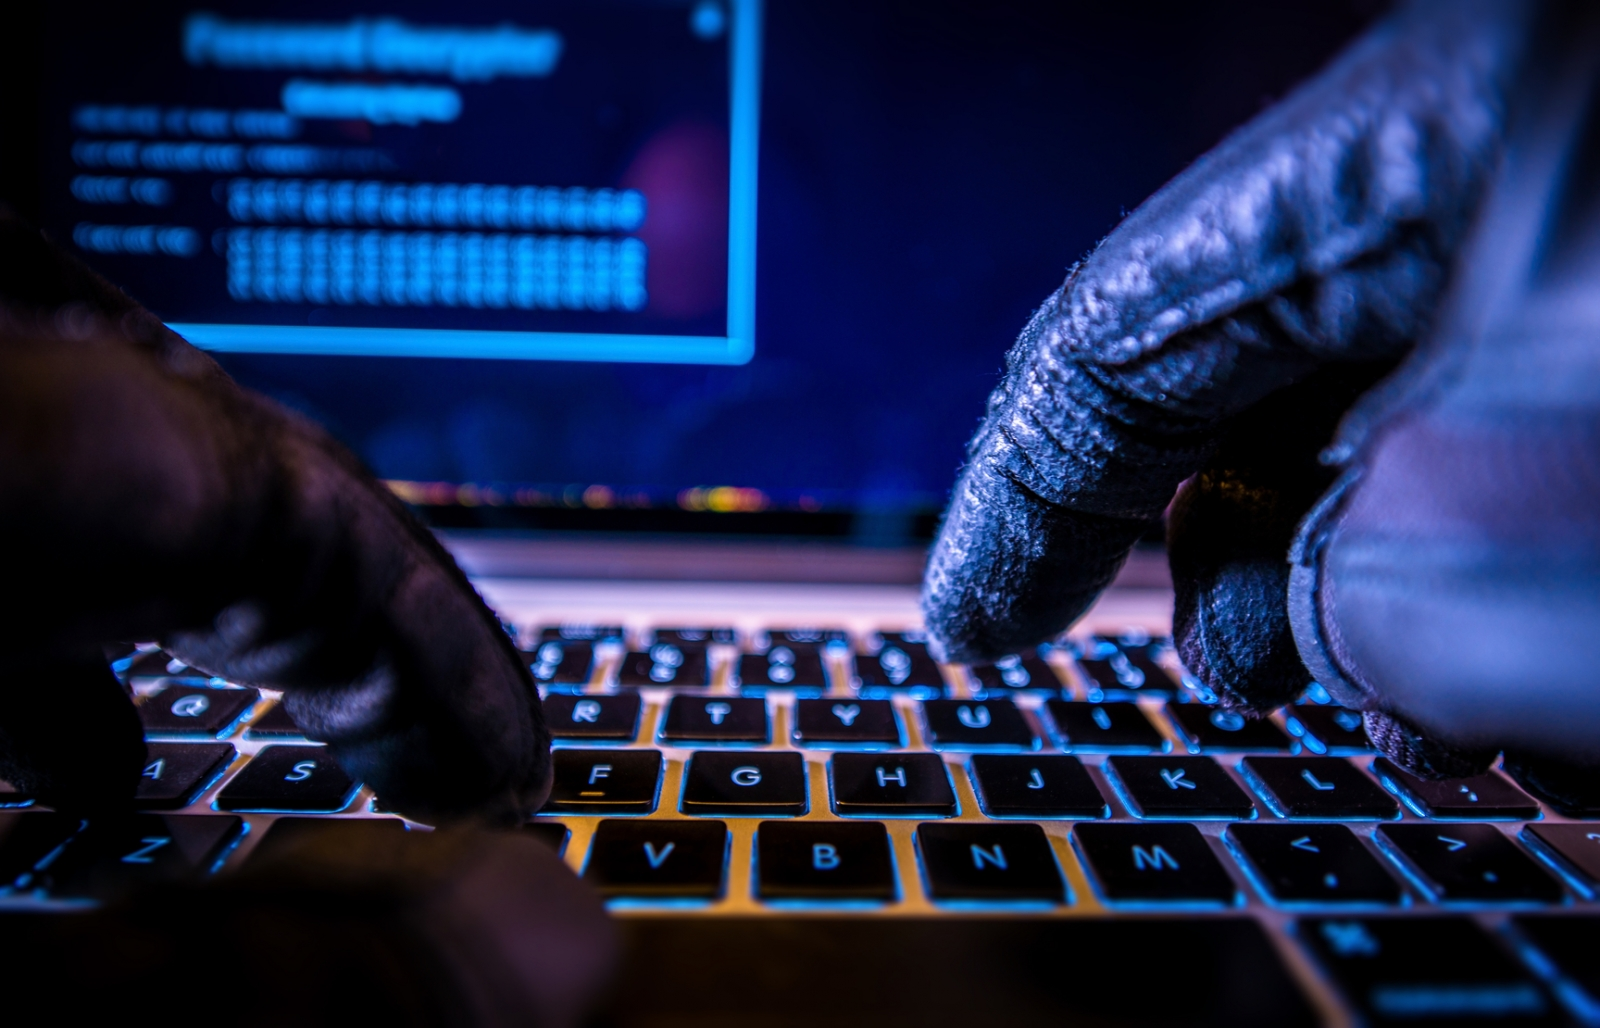 More hacking hands